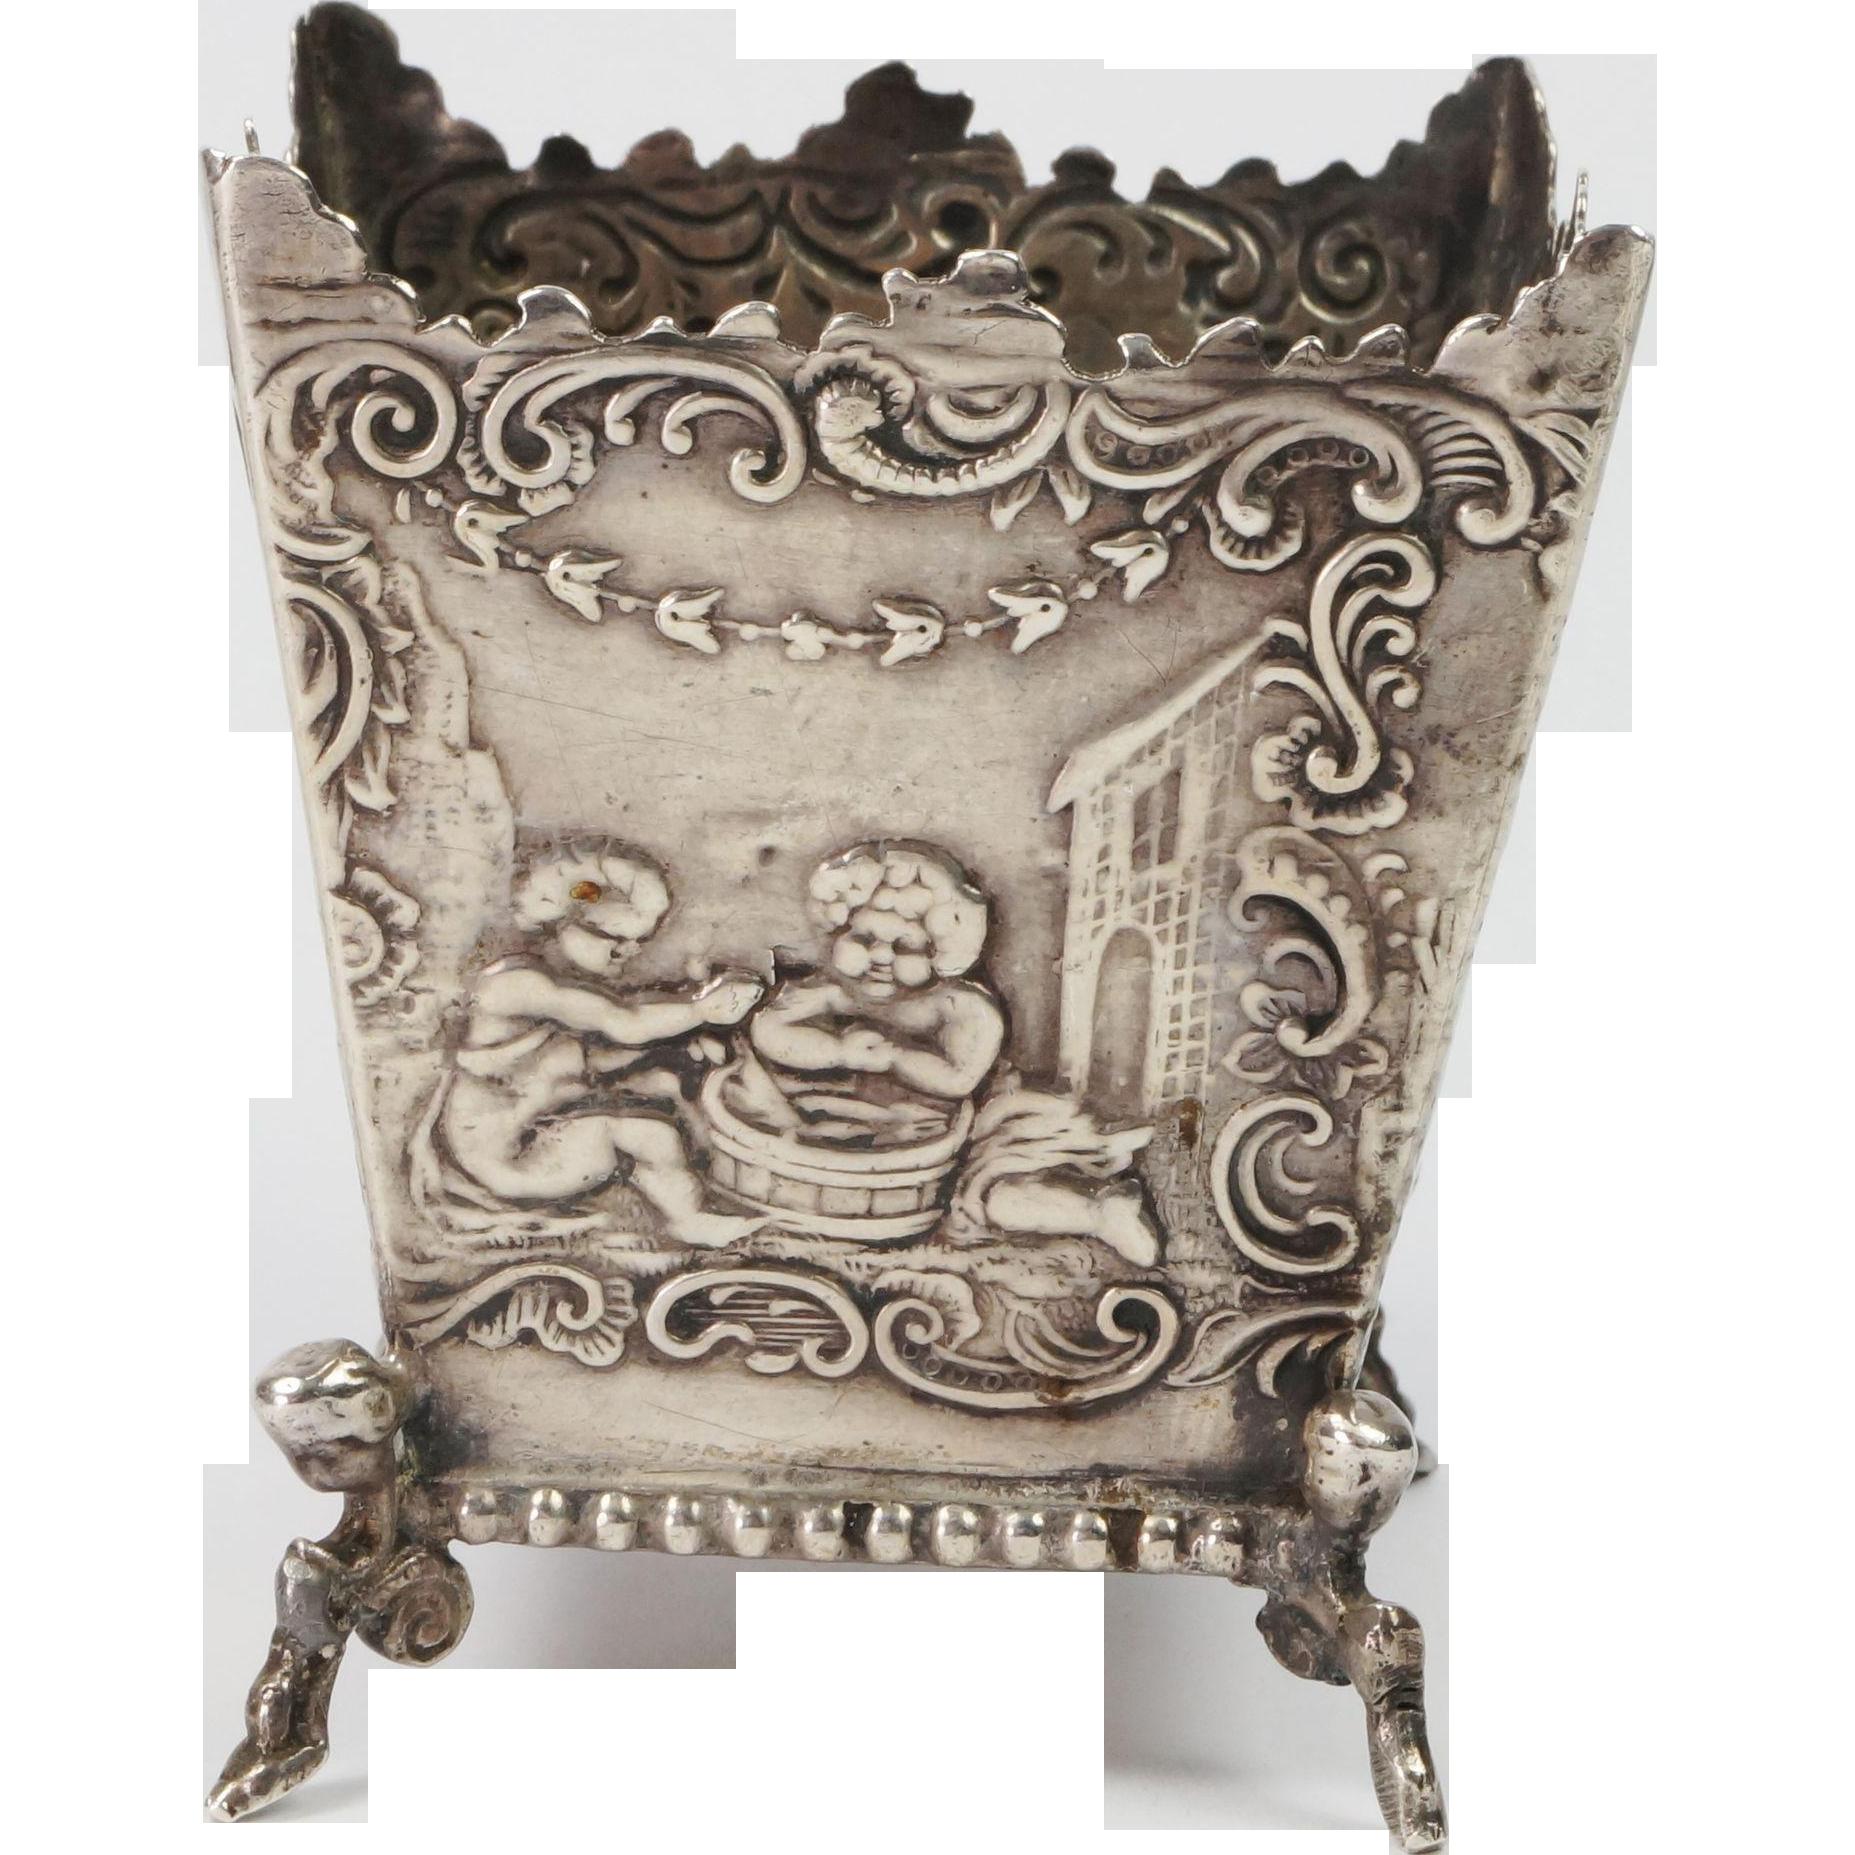 Antique 19th Century Miniature Dutch Silver 930 Repousse Jardinière Fully Hallmarked Circa 1800s